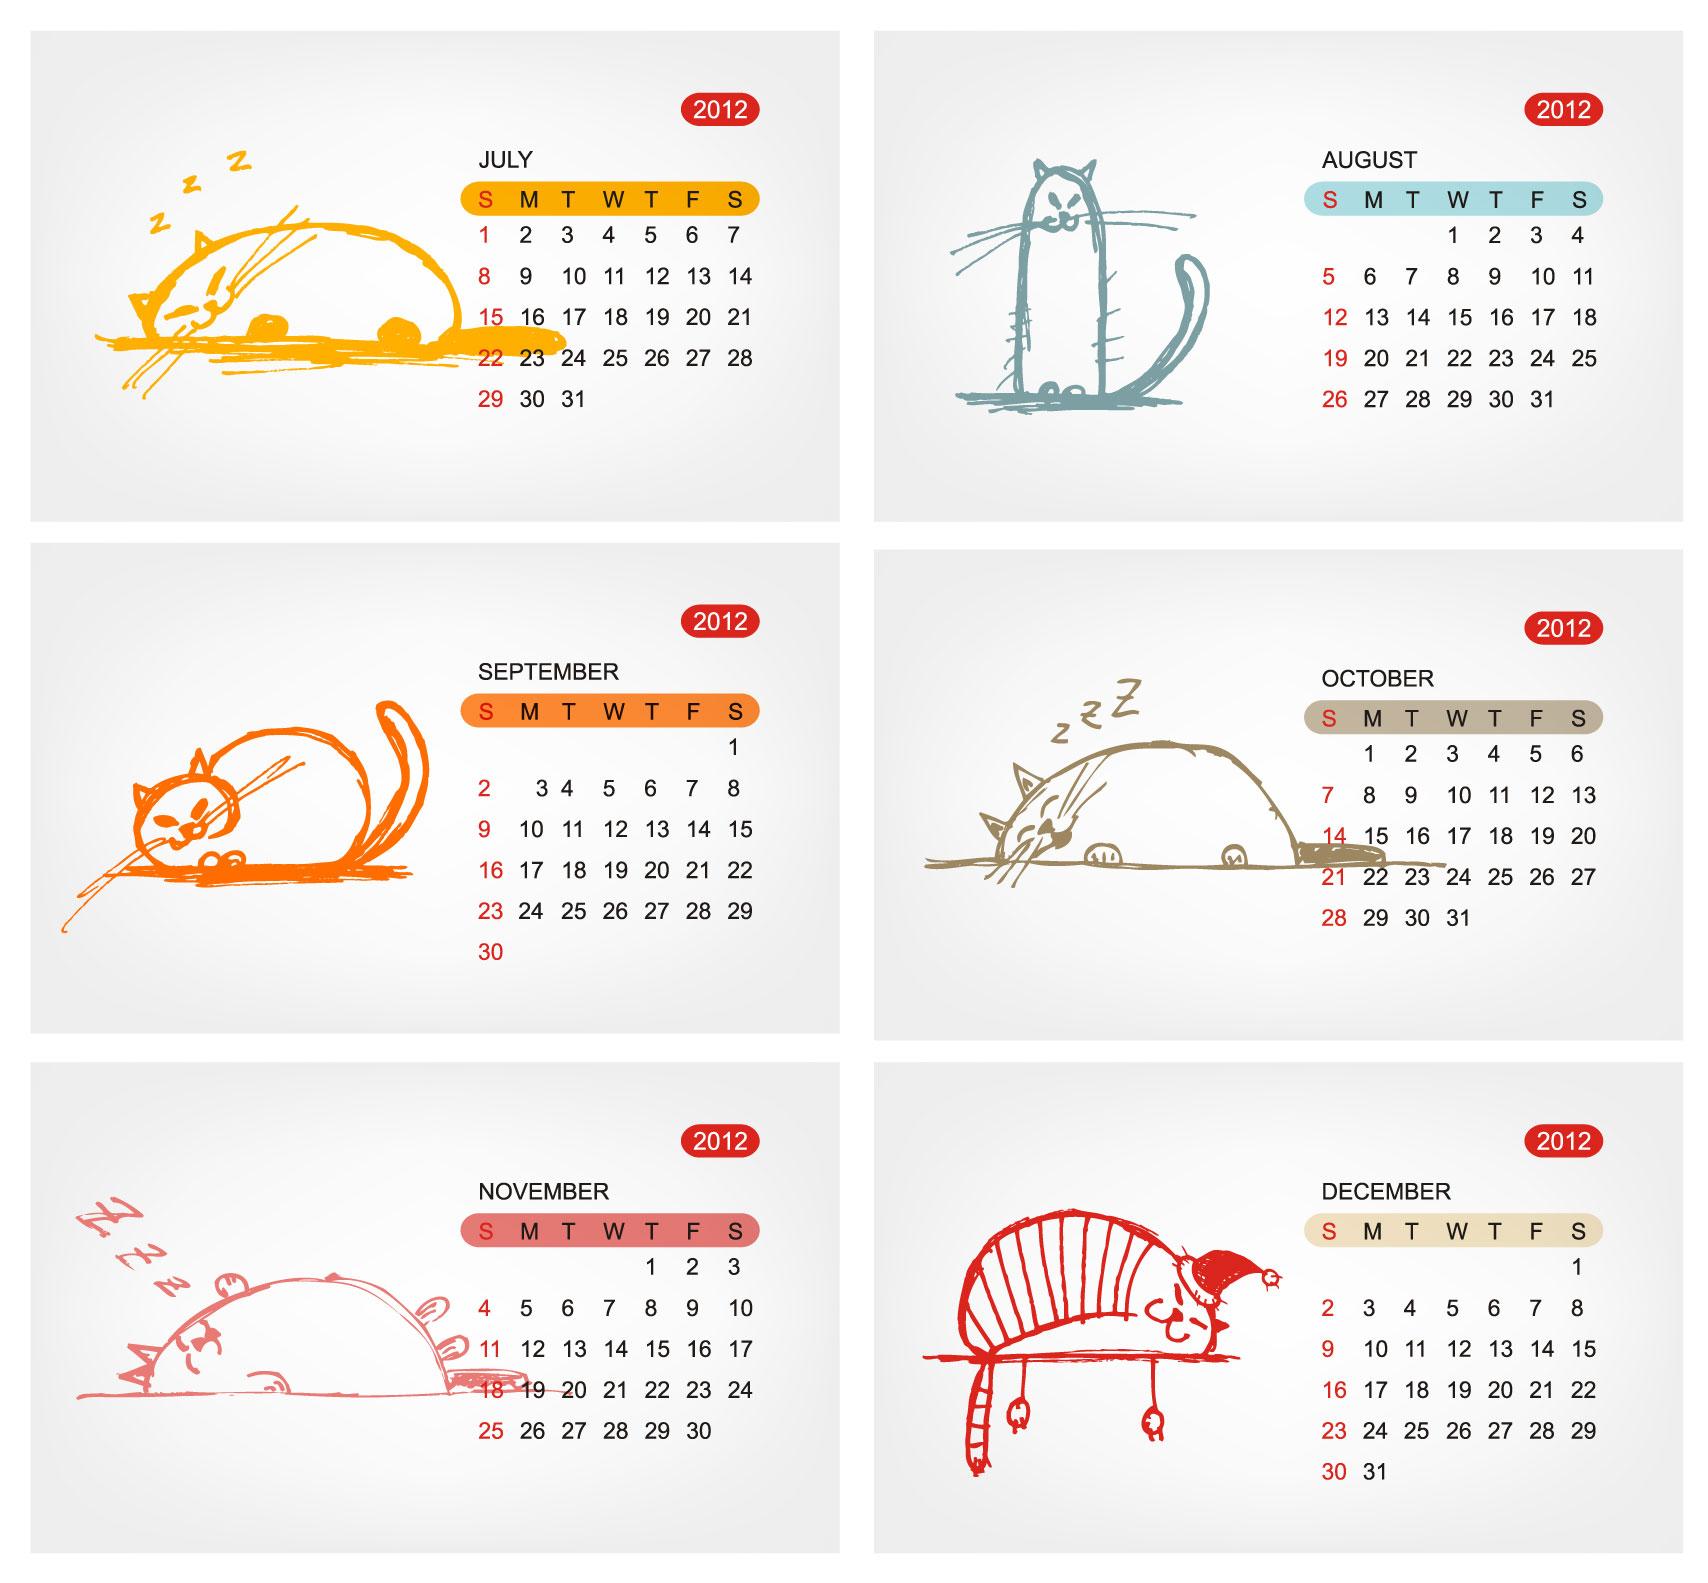 Calendar Illustration Template : Free calendar templates vector images